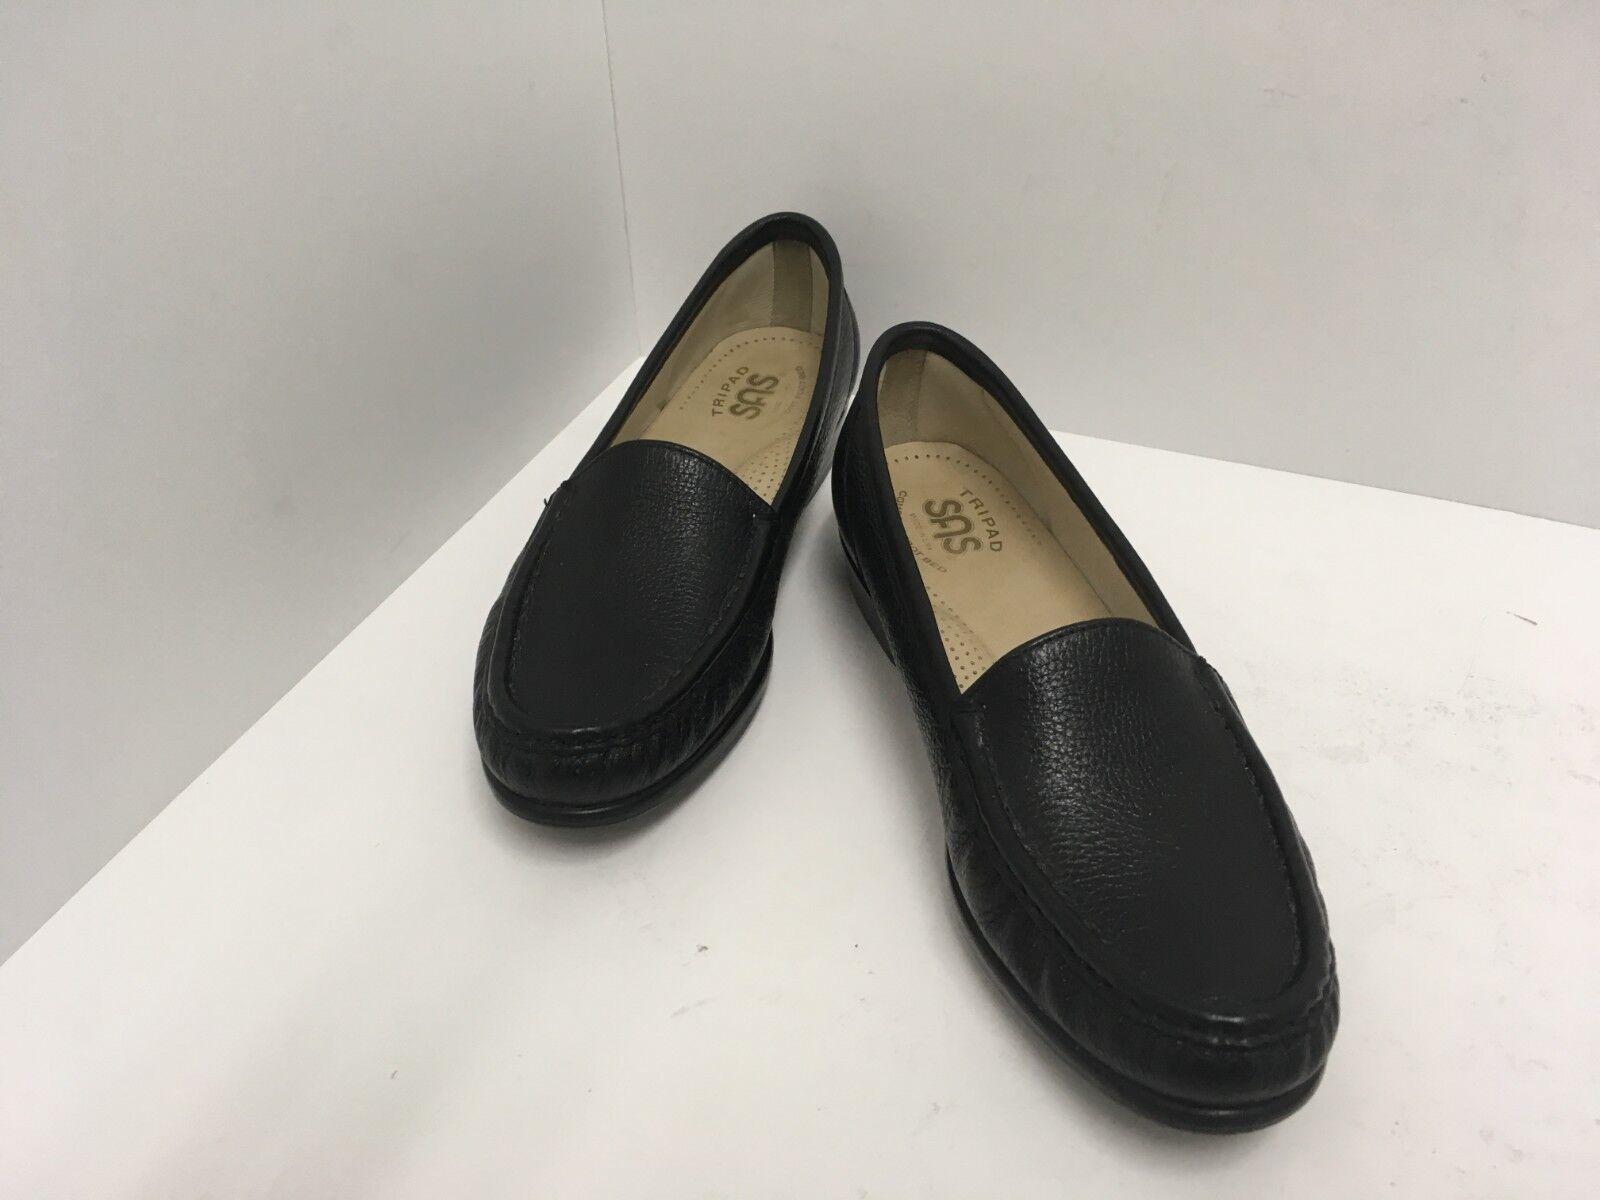 SAS Simplify Slip-On Womens Size 7N Black Leather Tripad Comfort Loafer Made USA